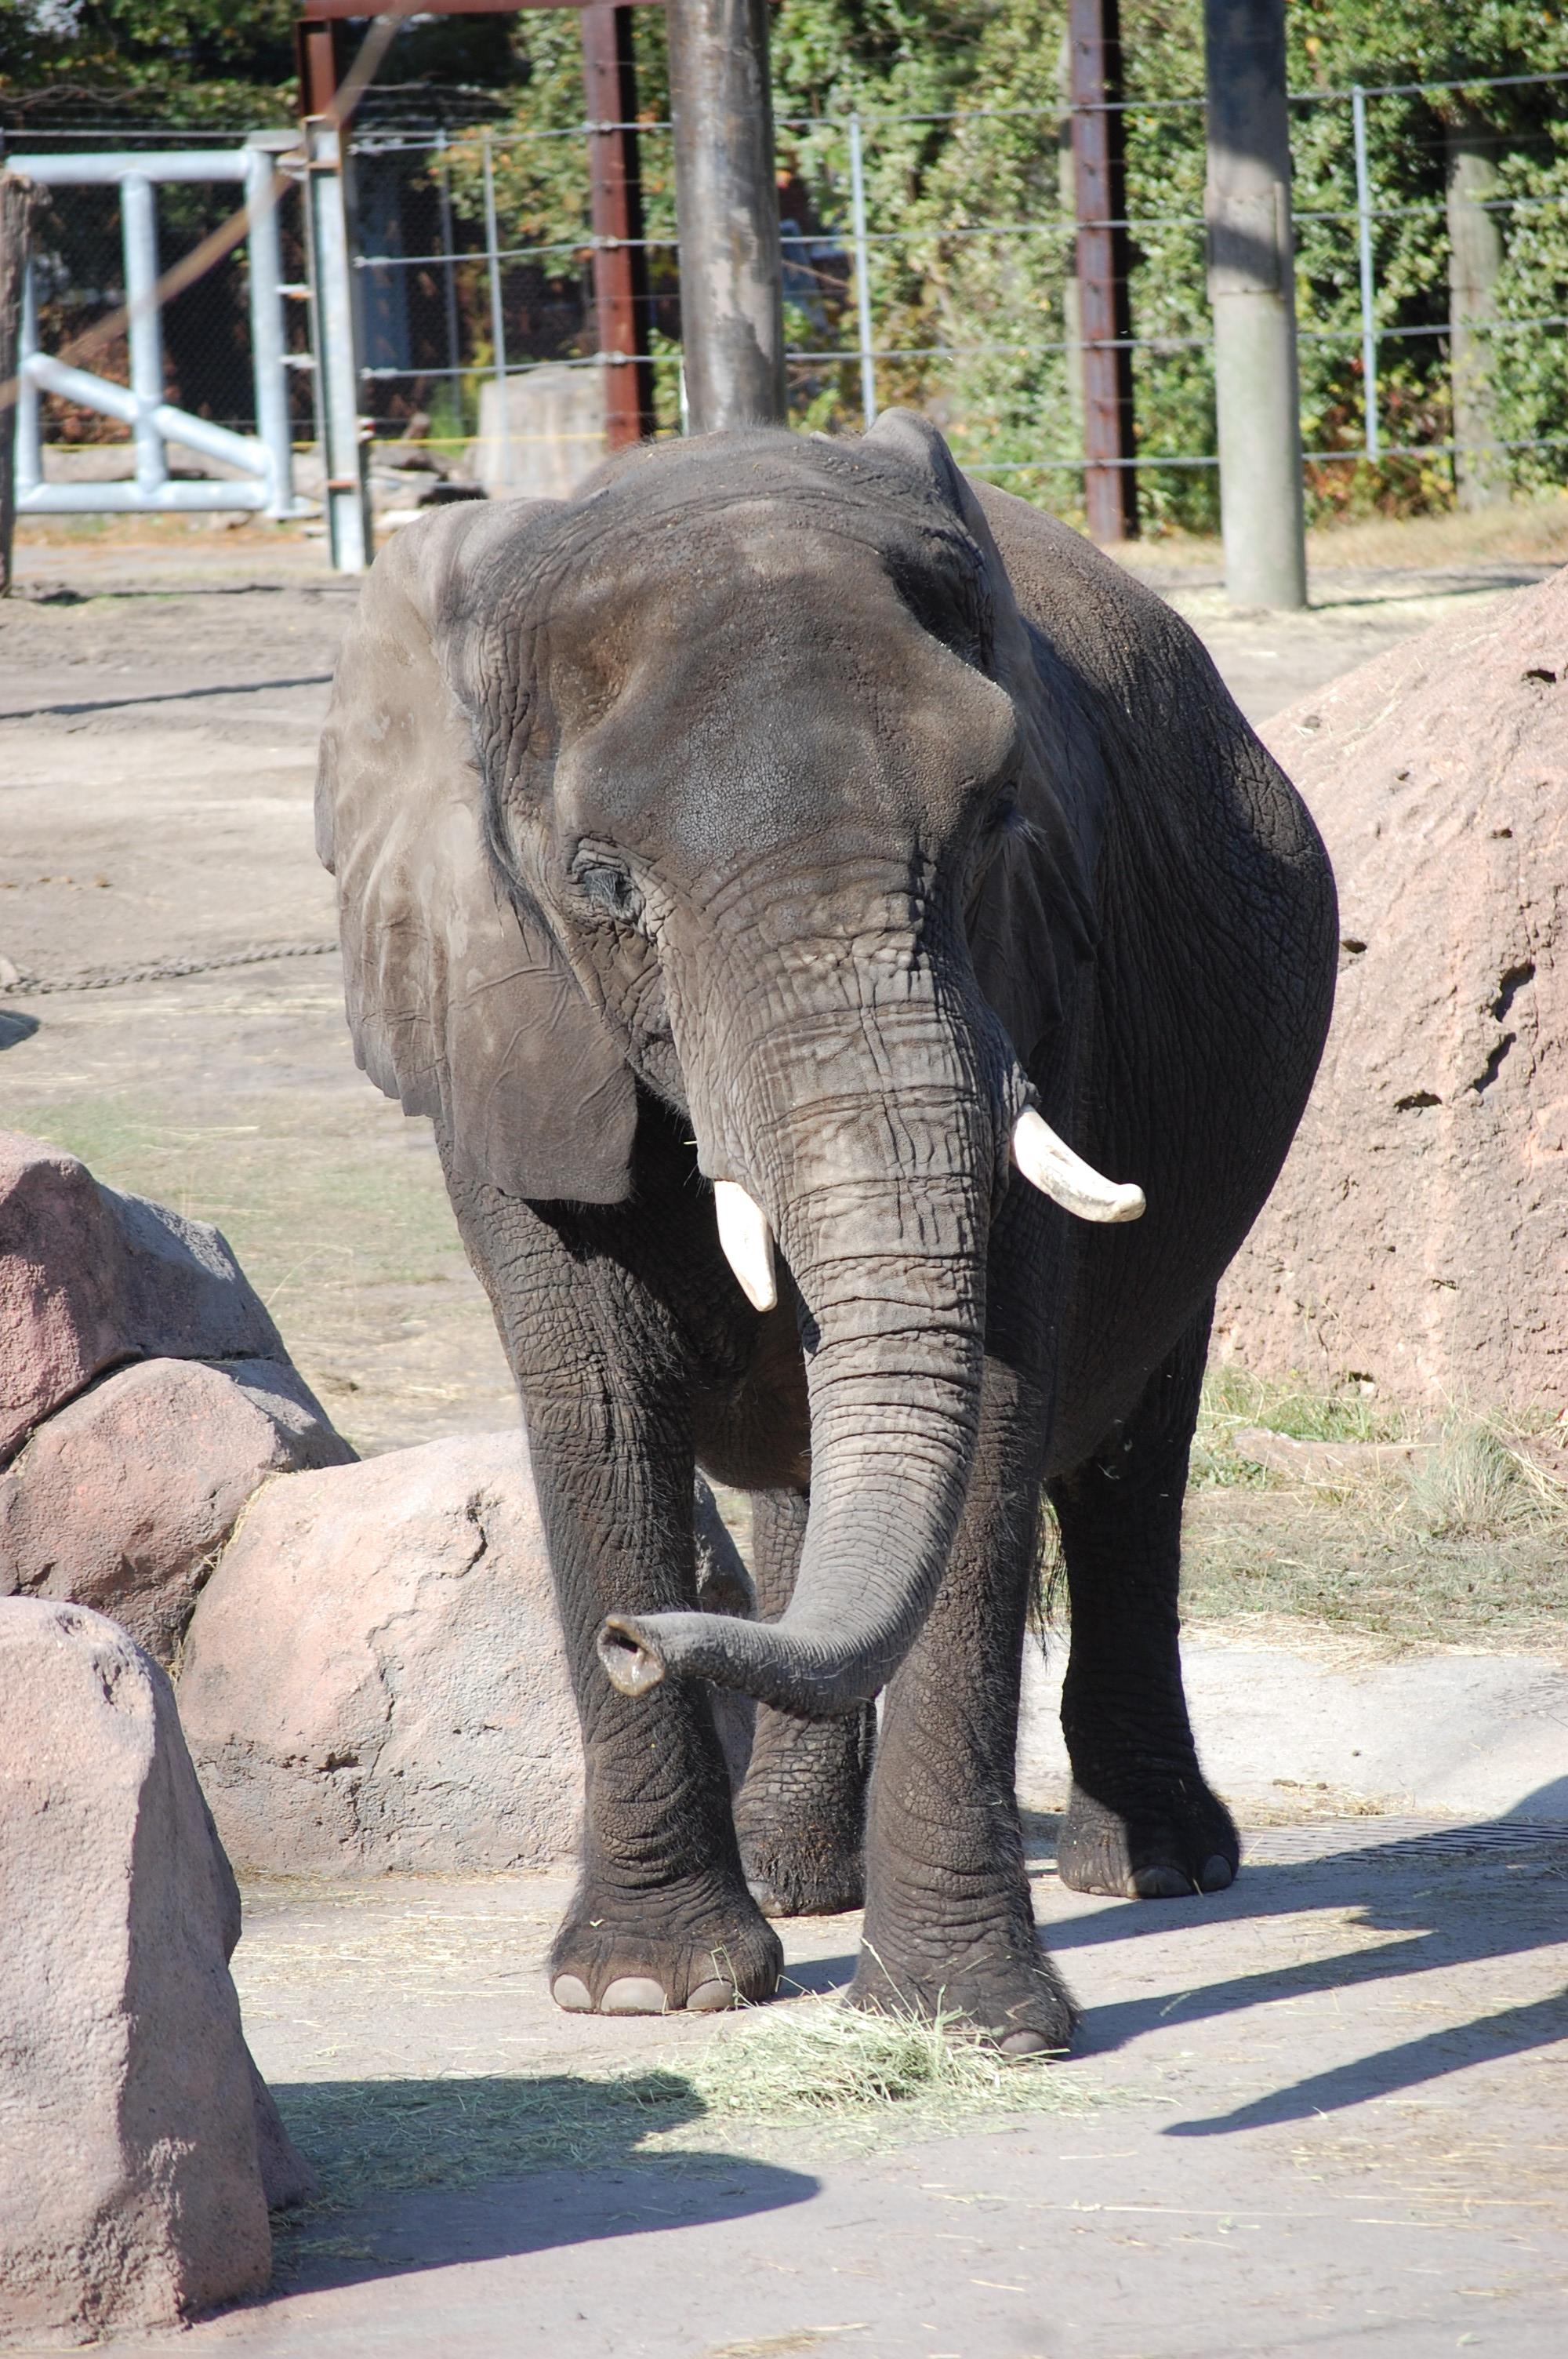 Elephant News - Virginia Zoo in Norfolk